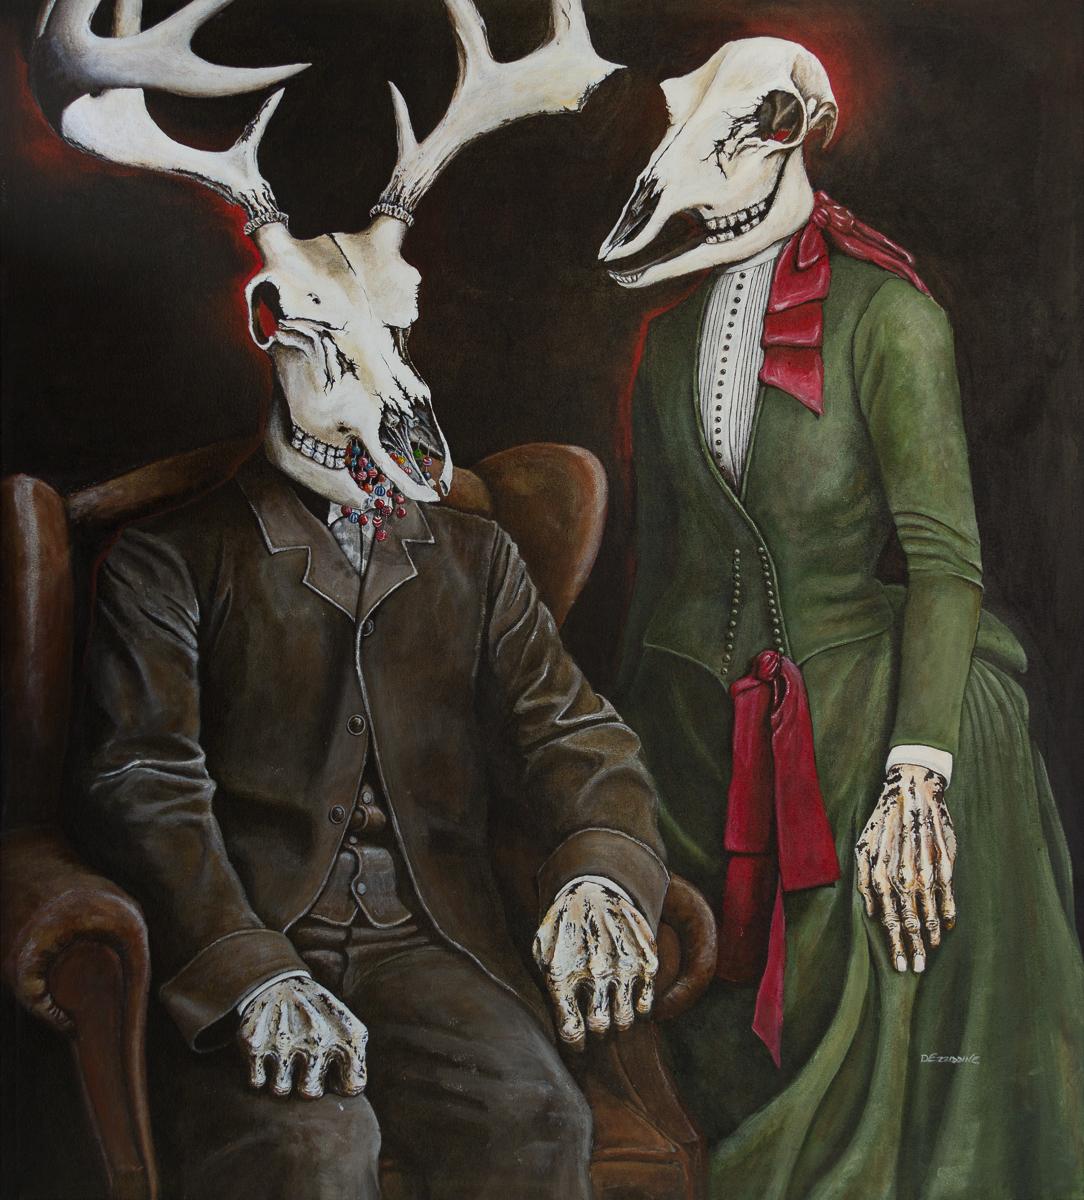 The Old Man & His Bride